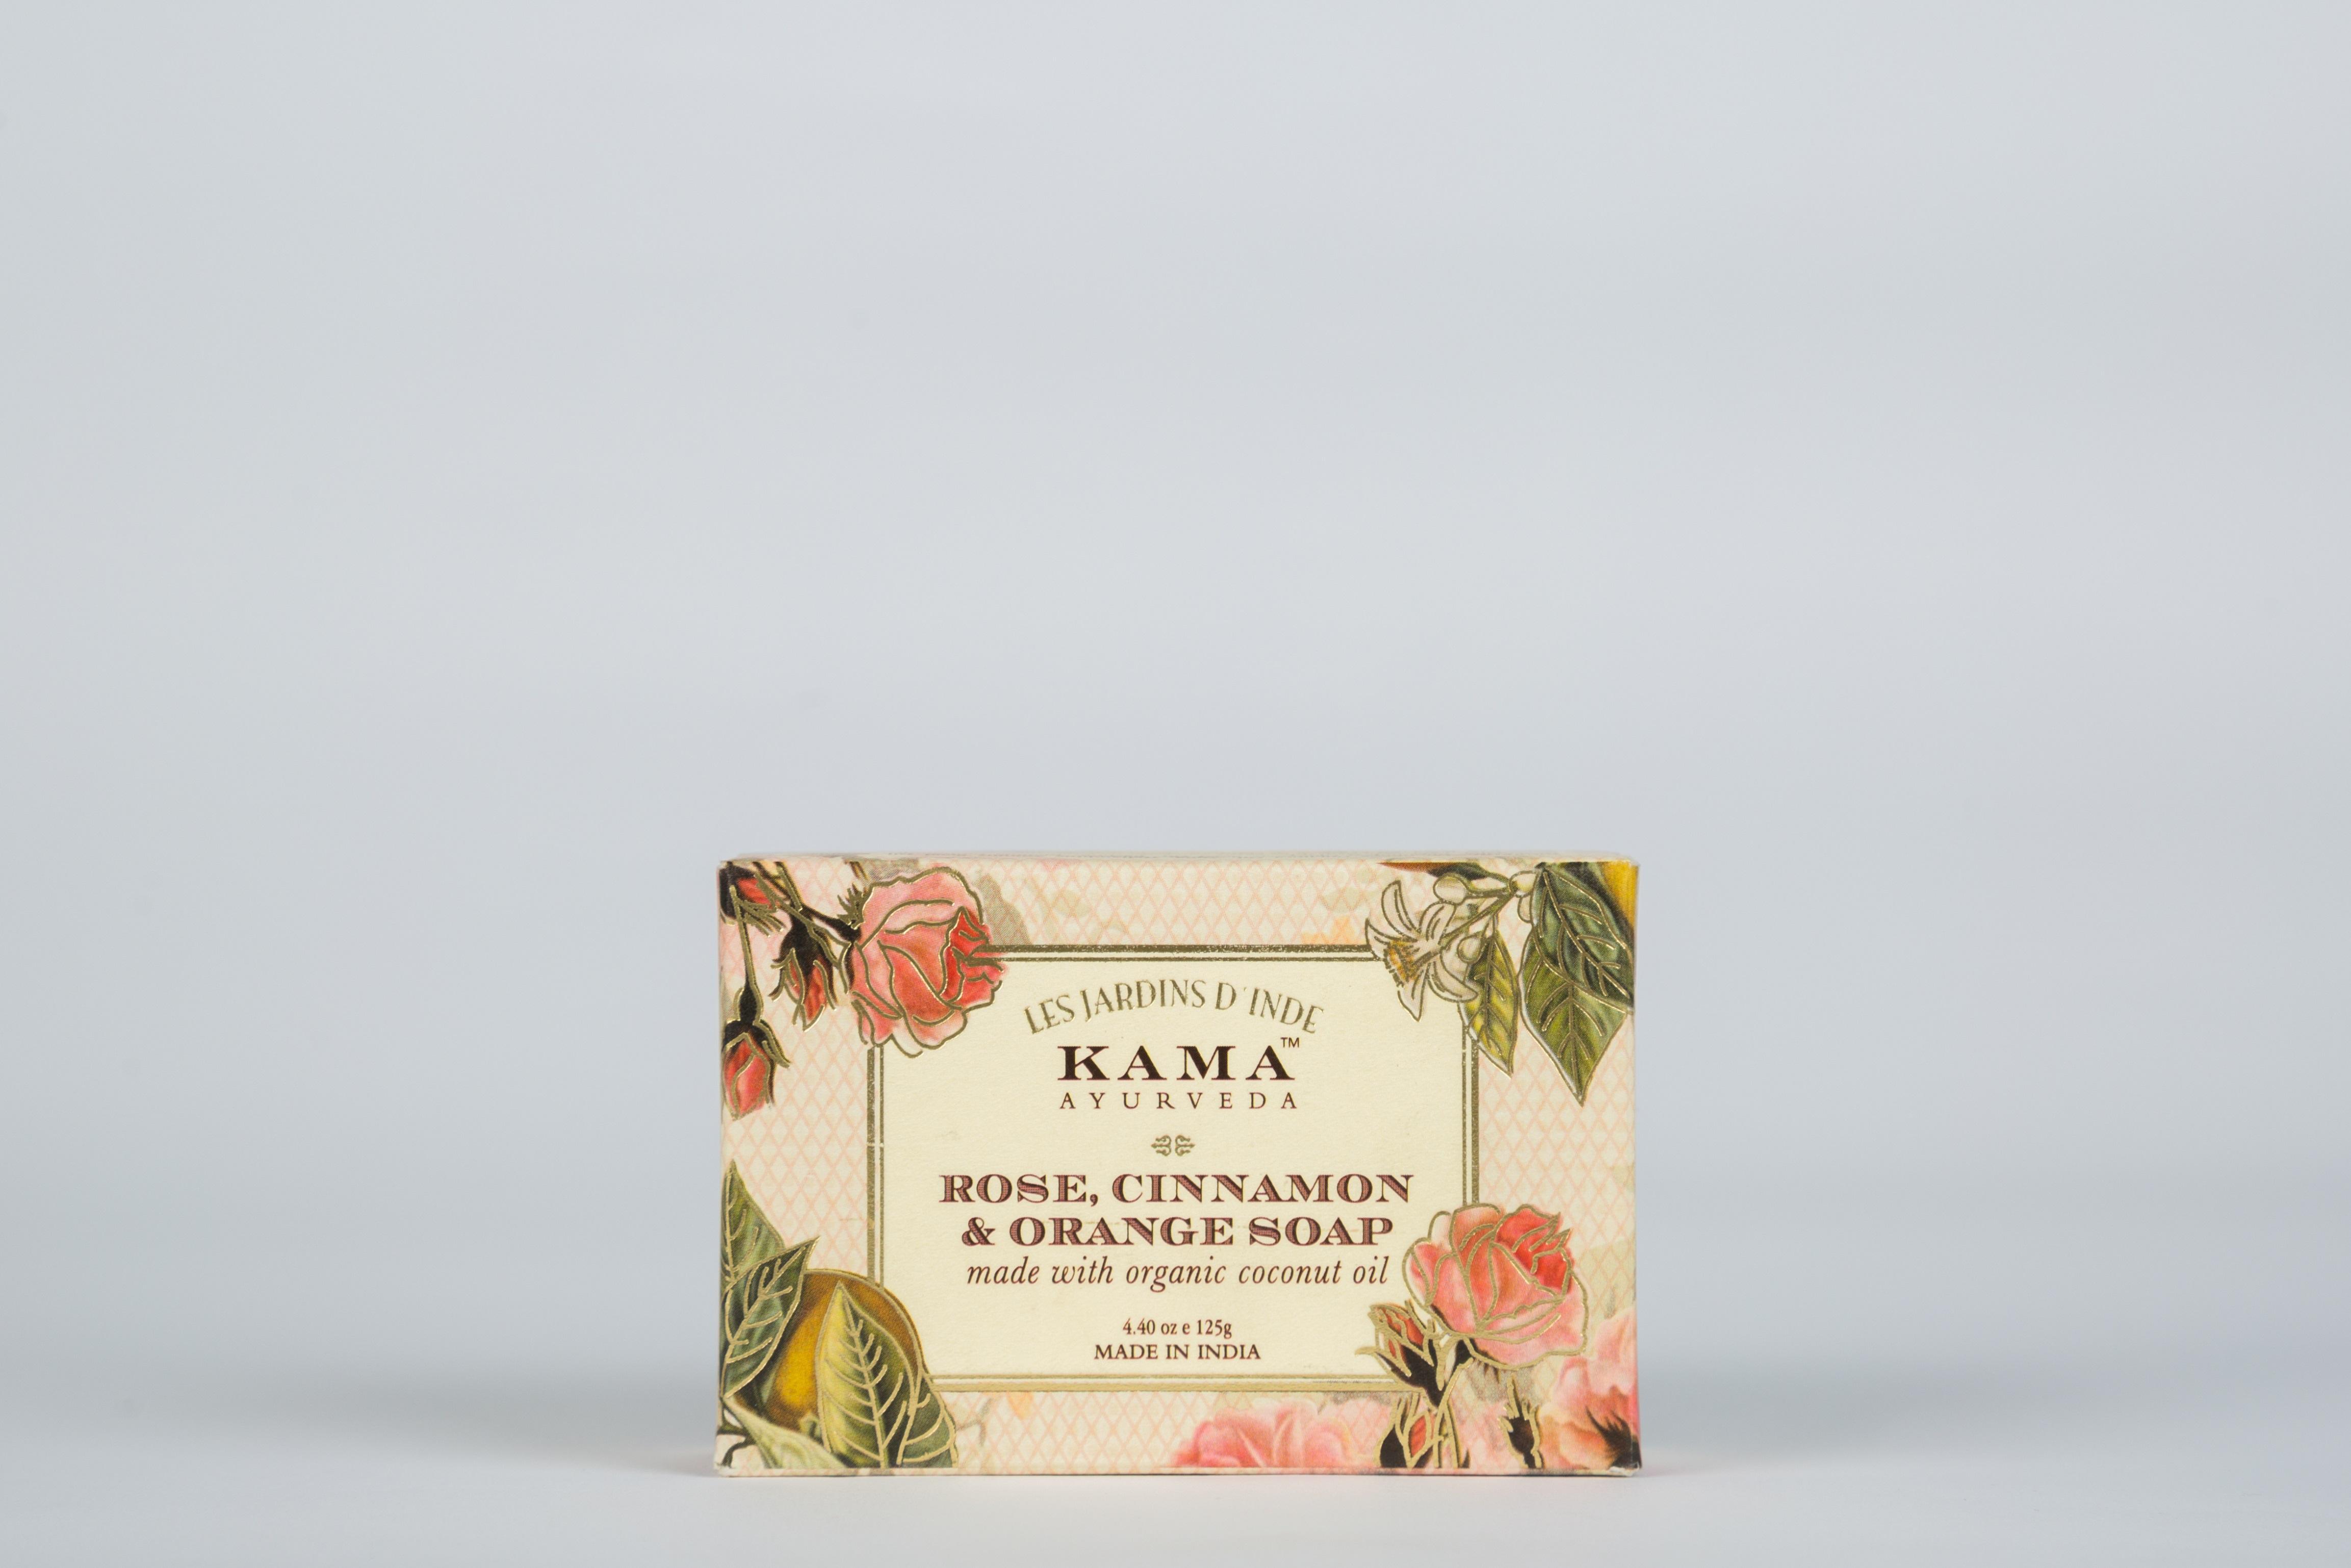 Rose, Cinnamon & Orange Soap (125 Gms) By Chosen Goods.